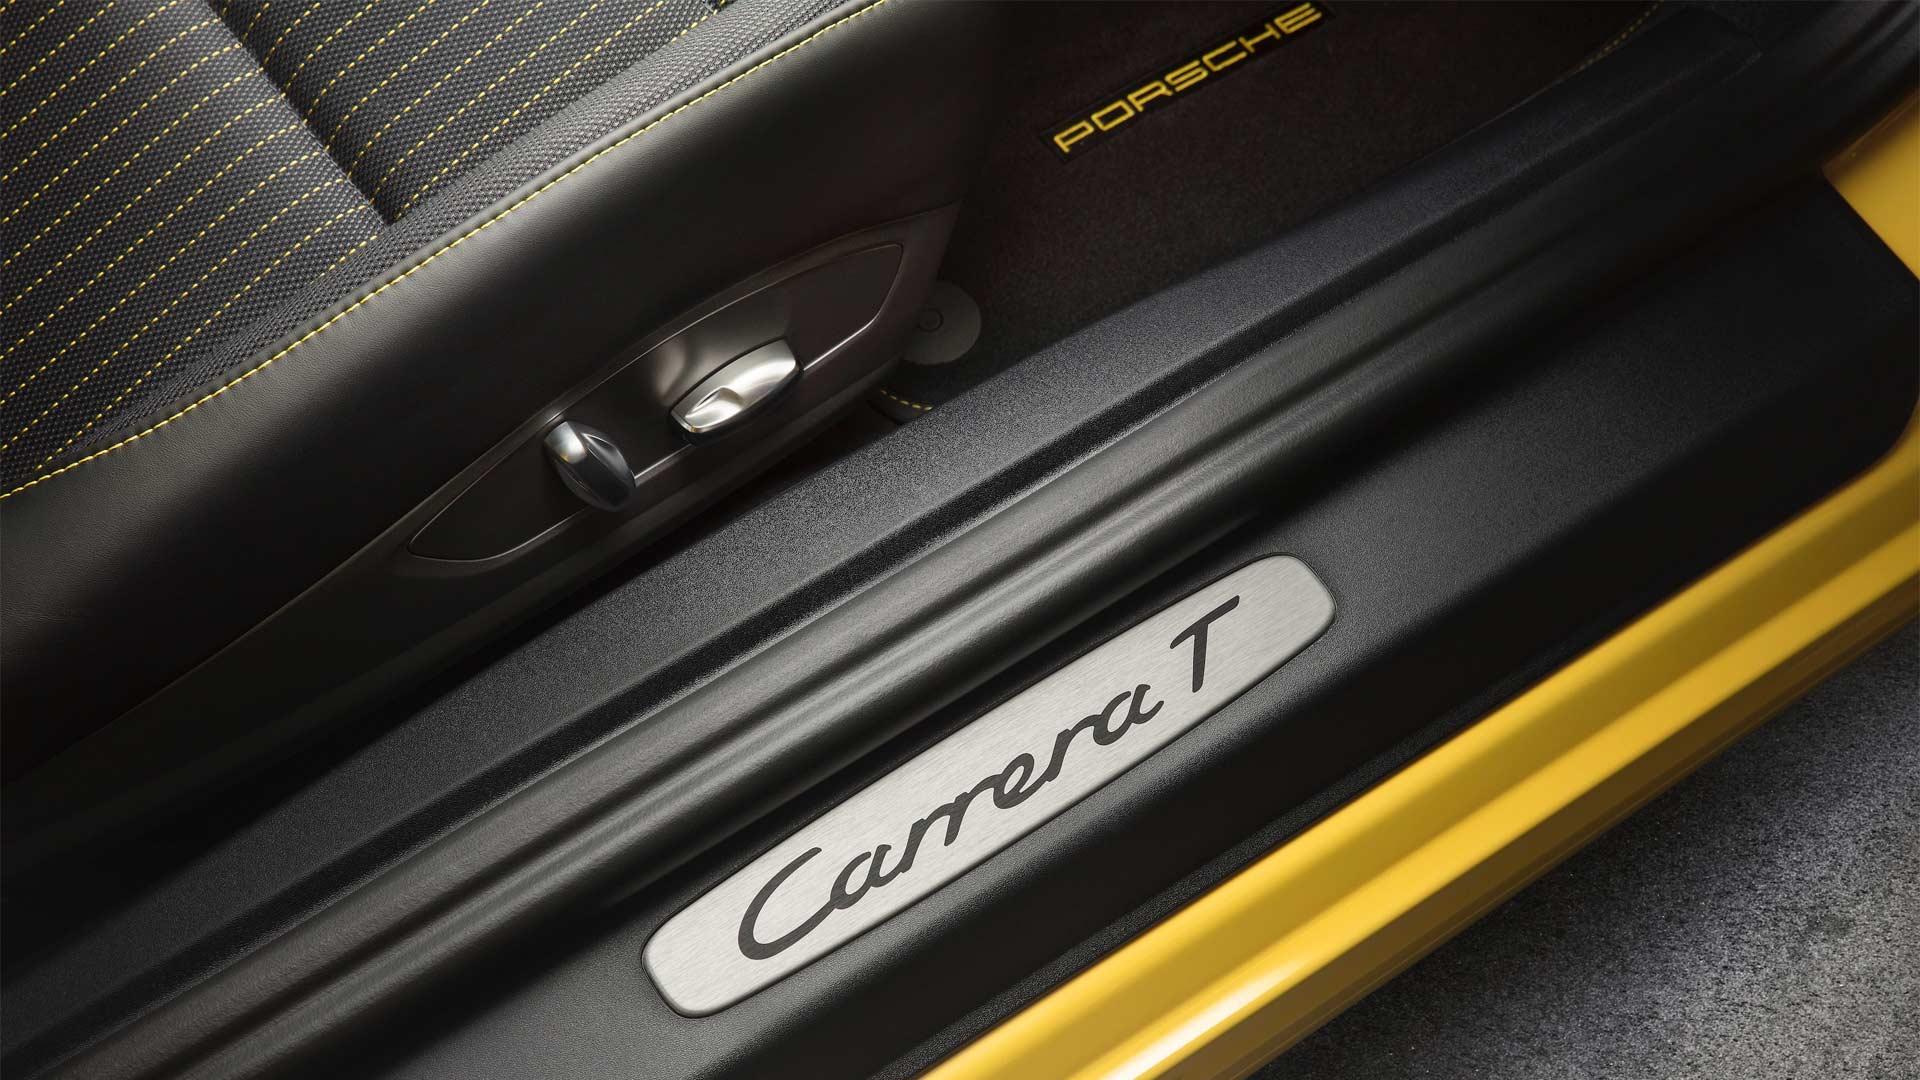 2018-Porsche-Carrera-T-Interior_4